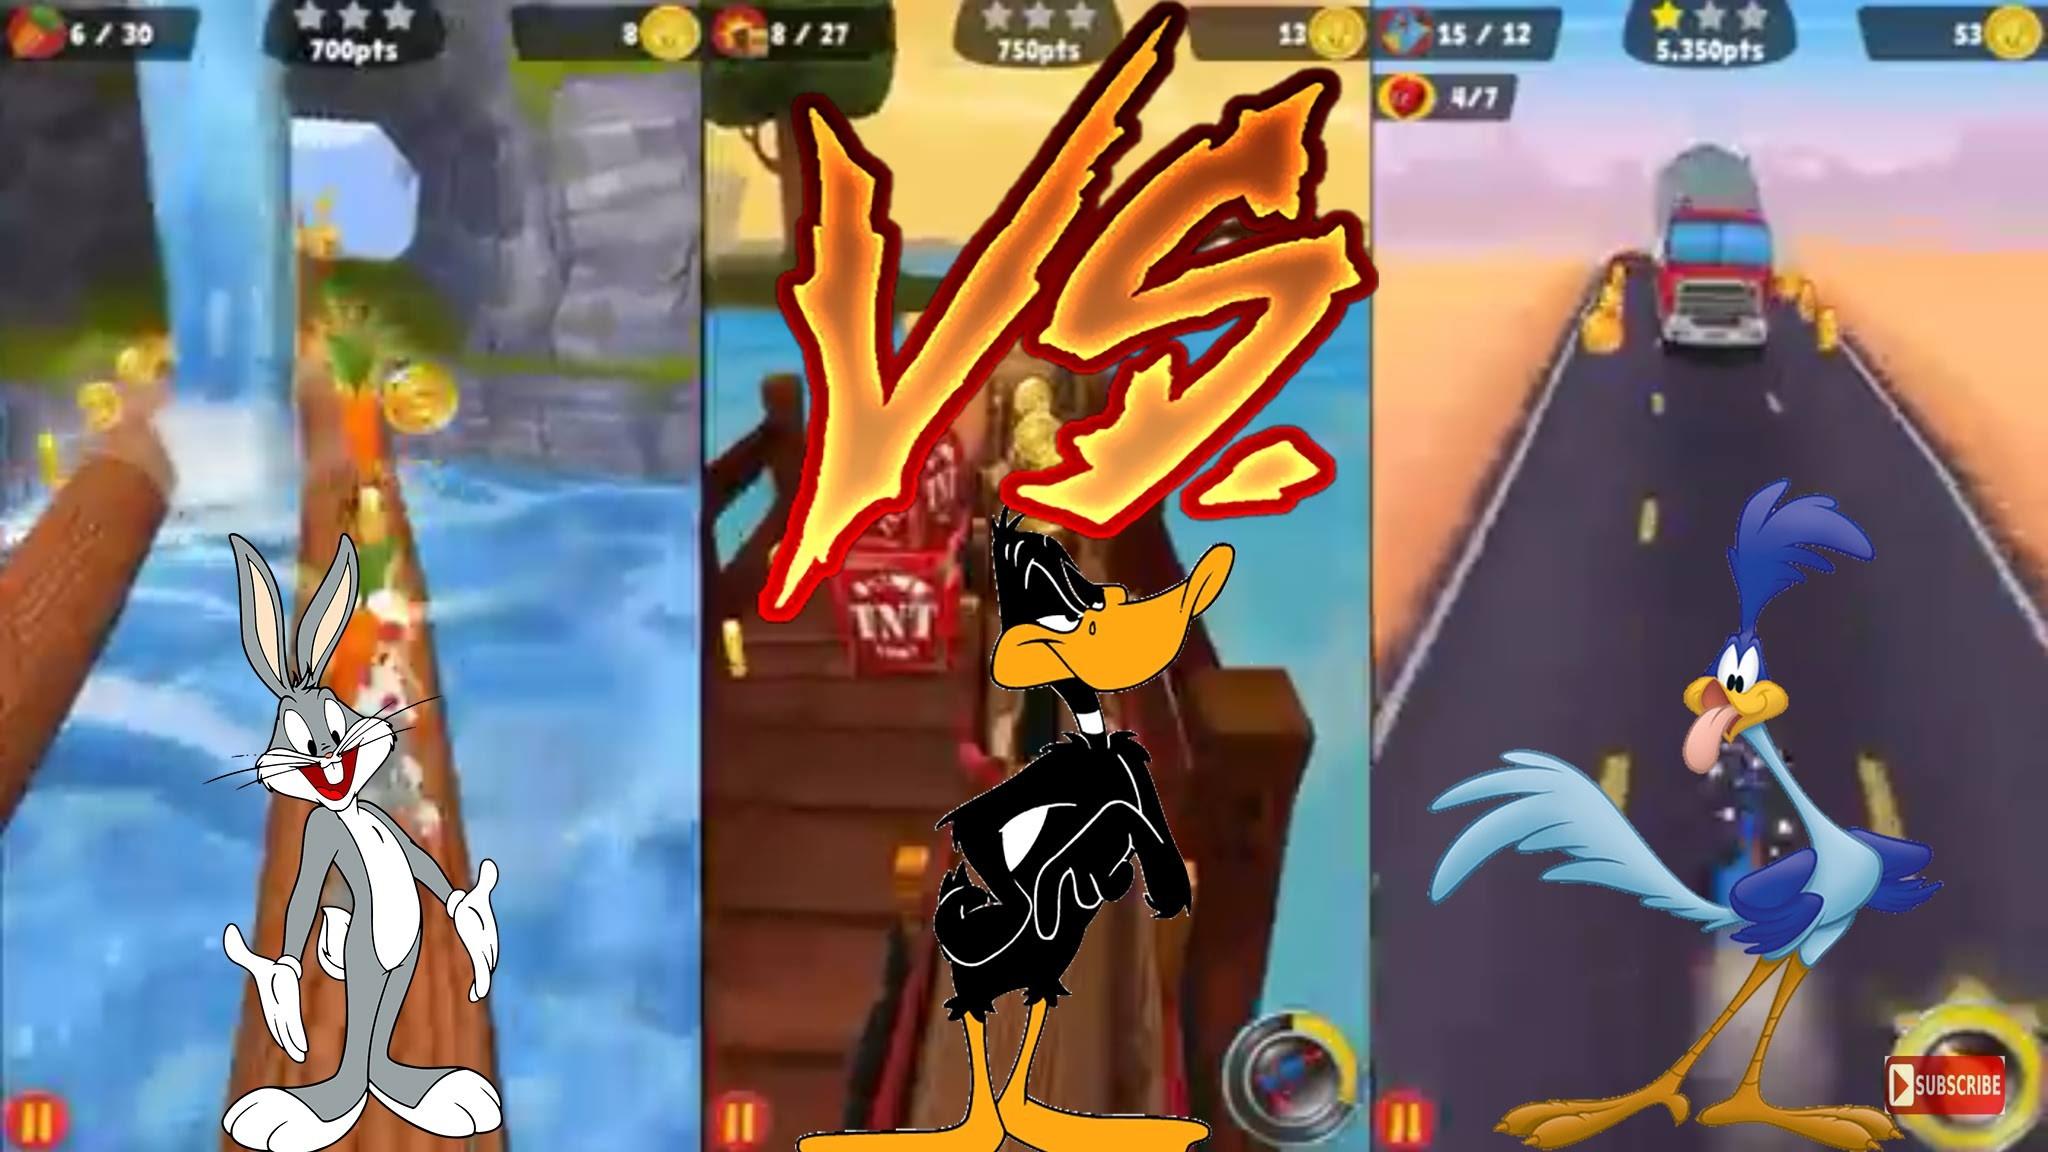 LOONEY TUNES – BUGS BUNNY vs DAFFY DUCK vs ROAD RUNNER Gameplay 2016